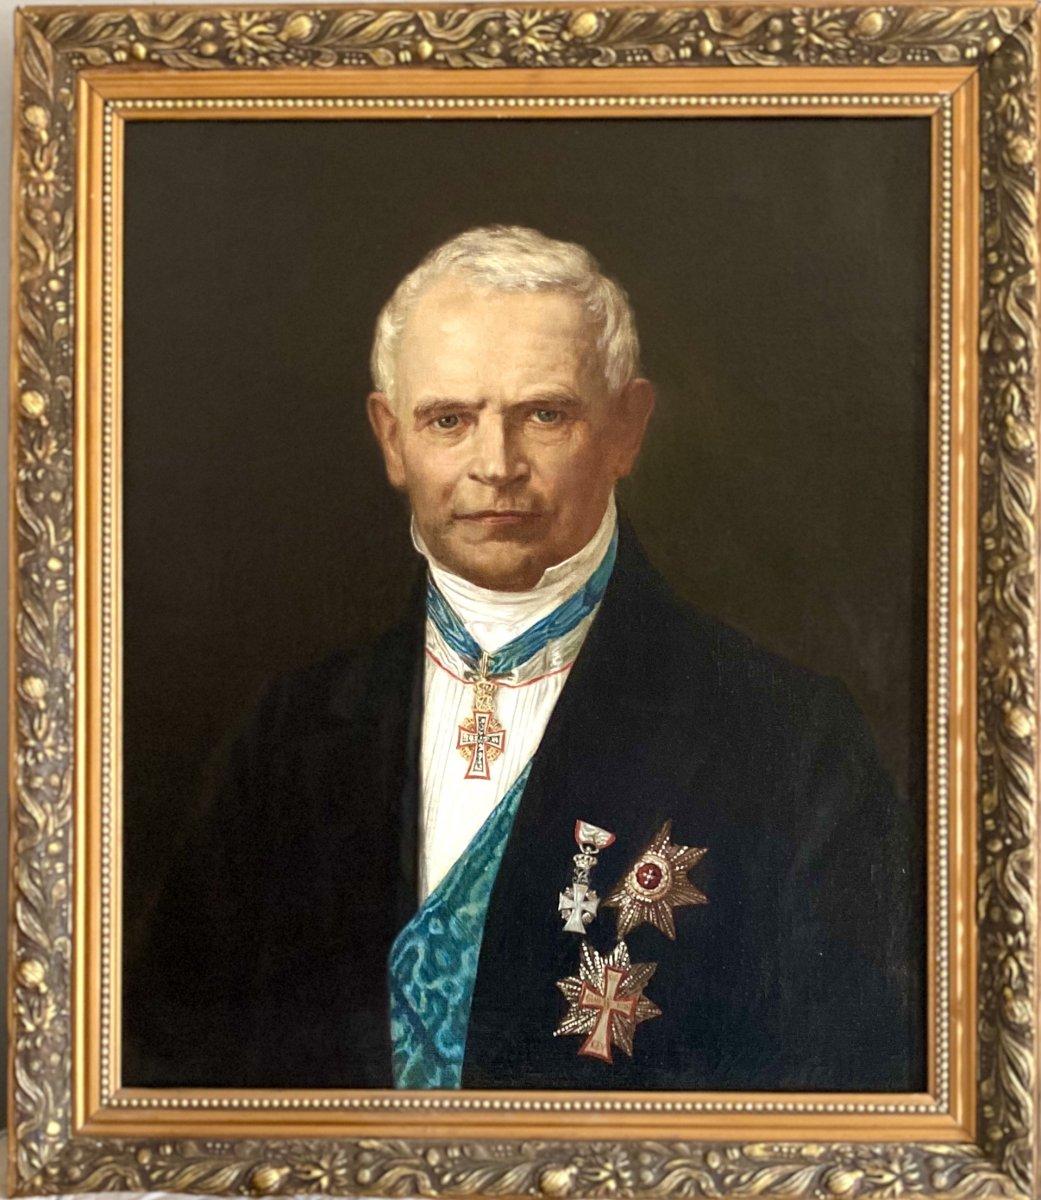 XIXth / Henrik Olrik / Hst / Orders Of The Elephant And The Dannebrog / Denmark / 1881 / Portrait